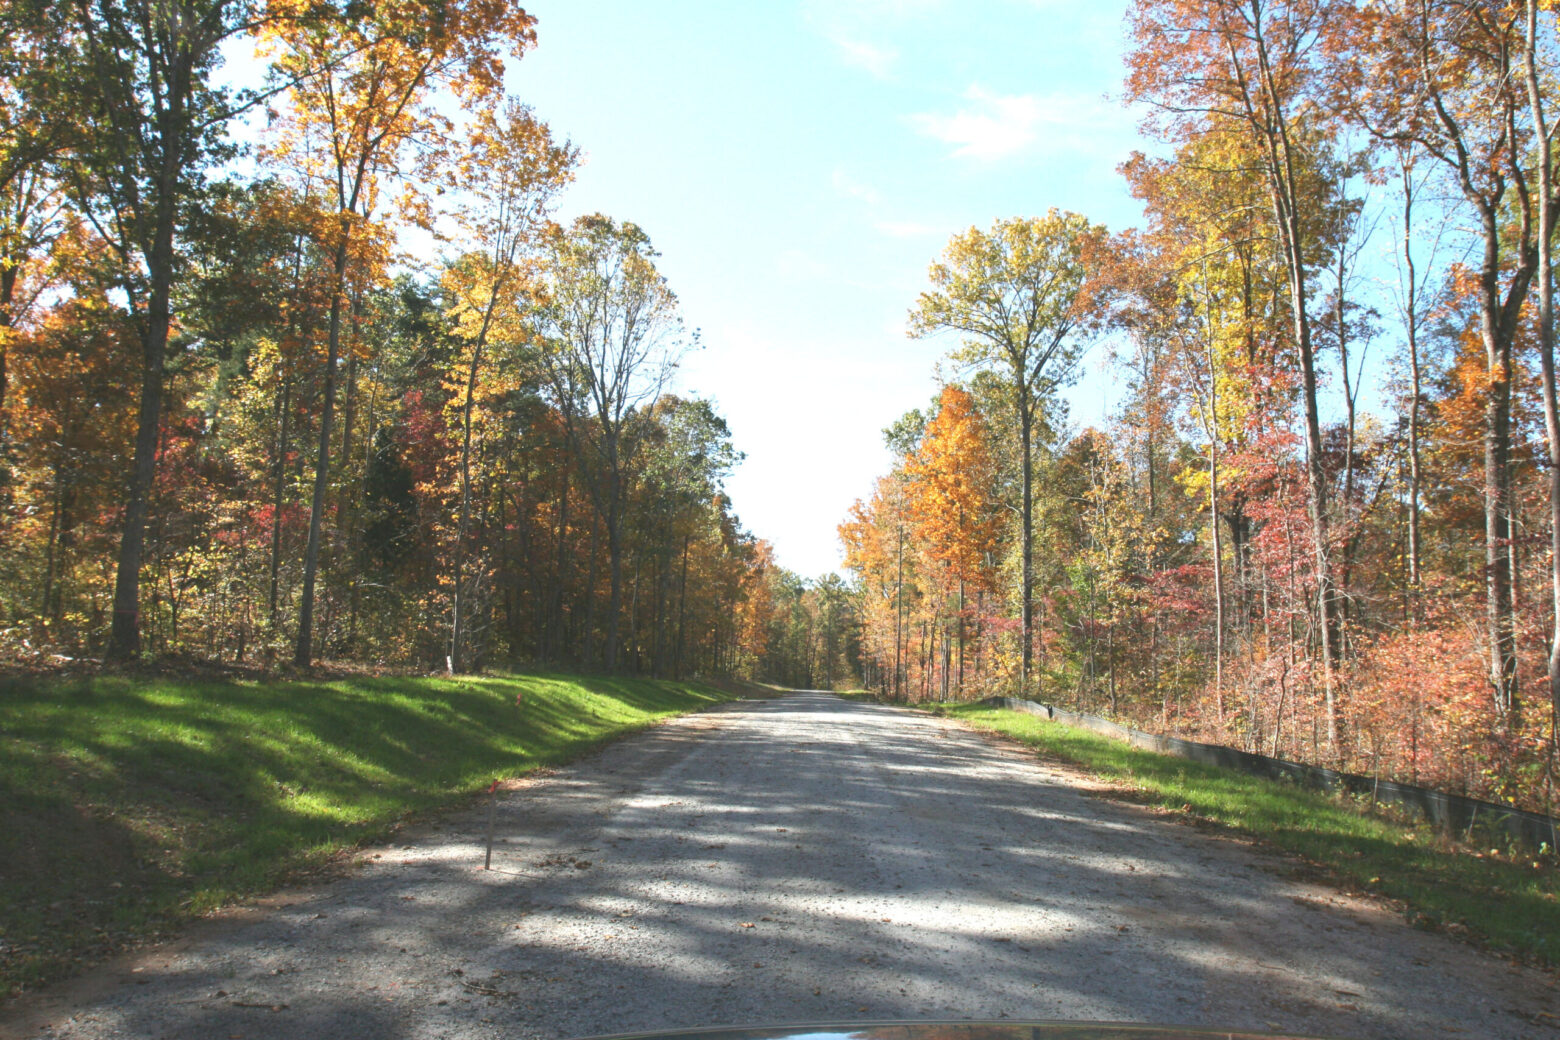 Land for Sale in Pamplin, VA